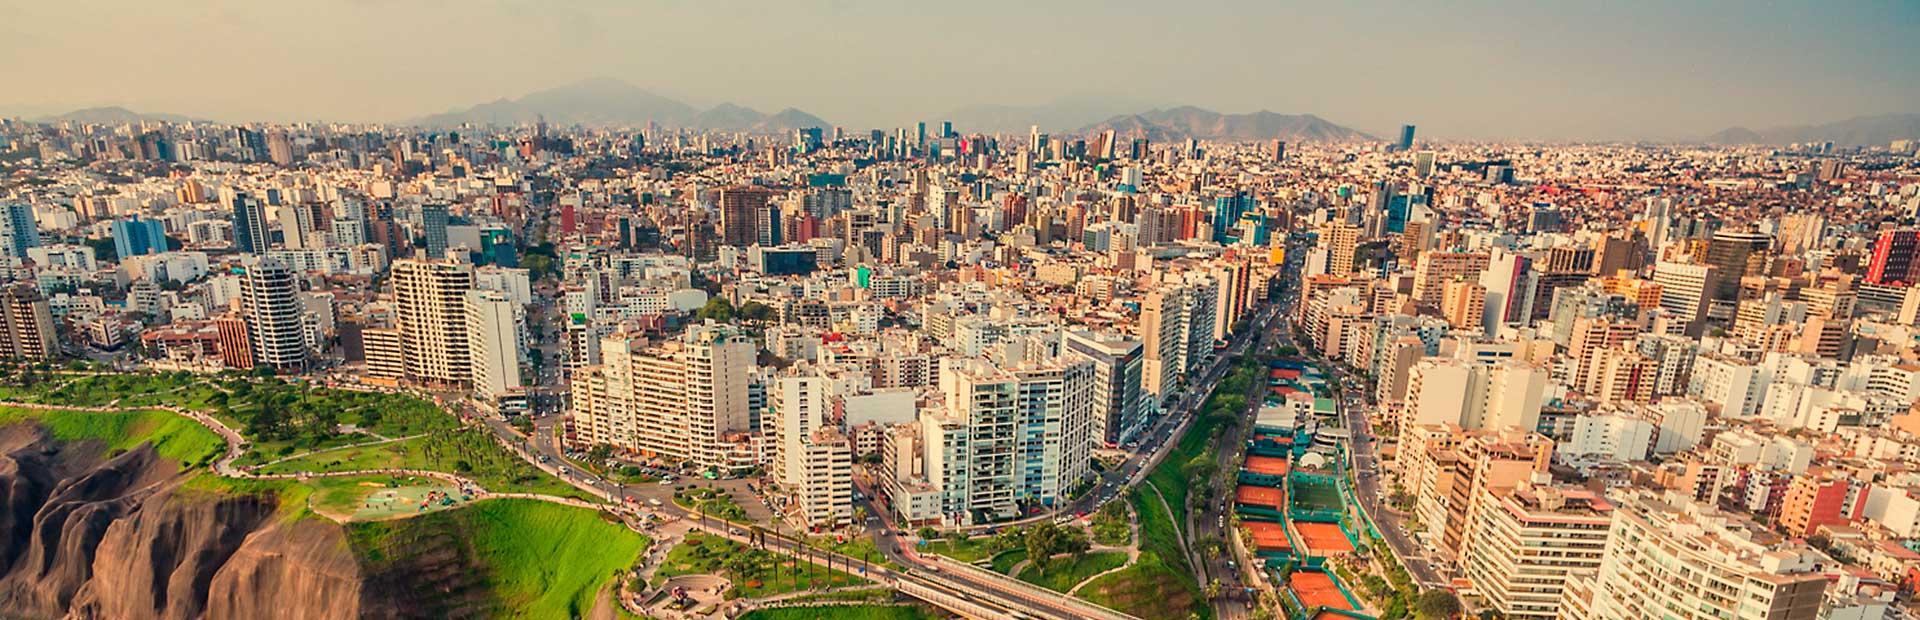 Lima - Peru - APEFAM